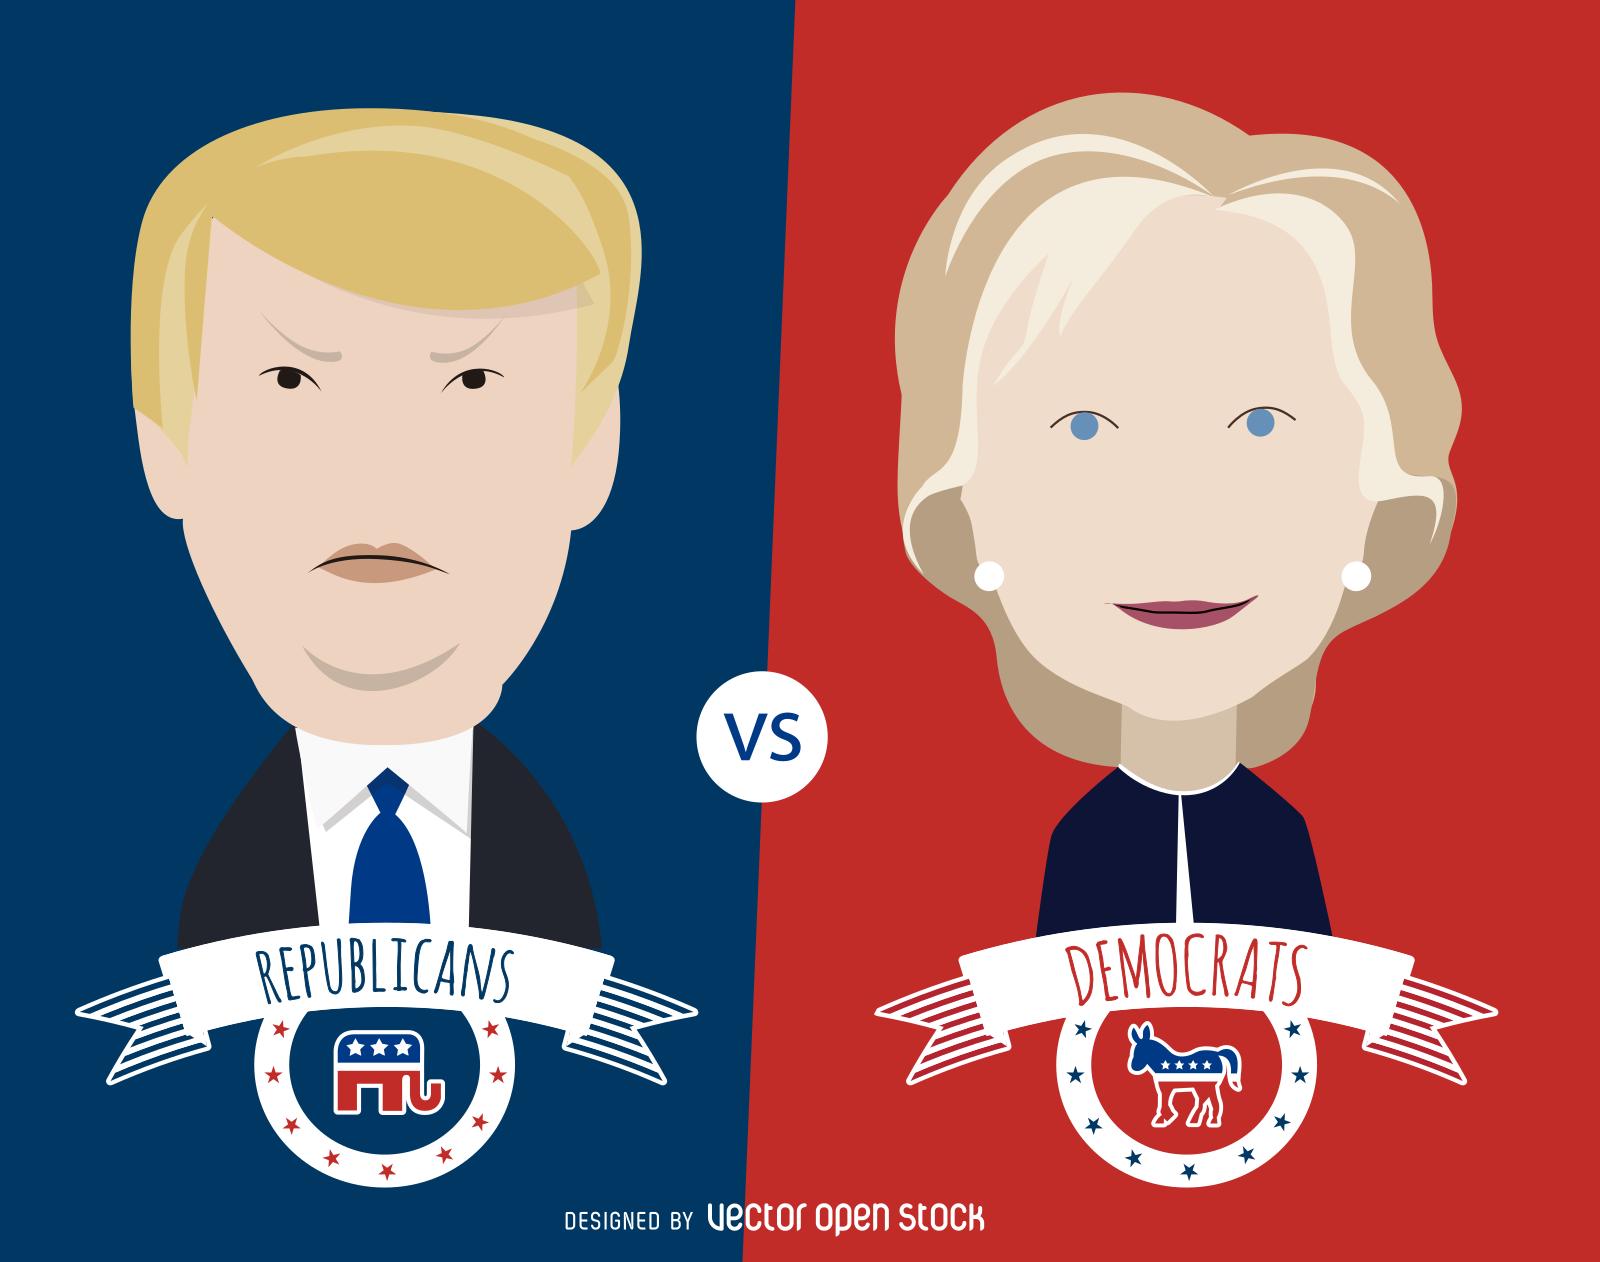 USAVector_022-01_Clinton_and_Trump_cartoon_illustration.svg.png